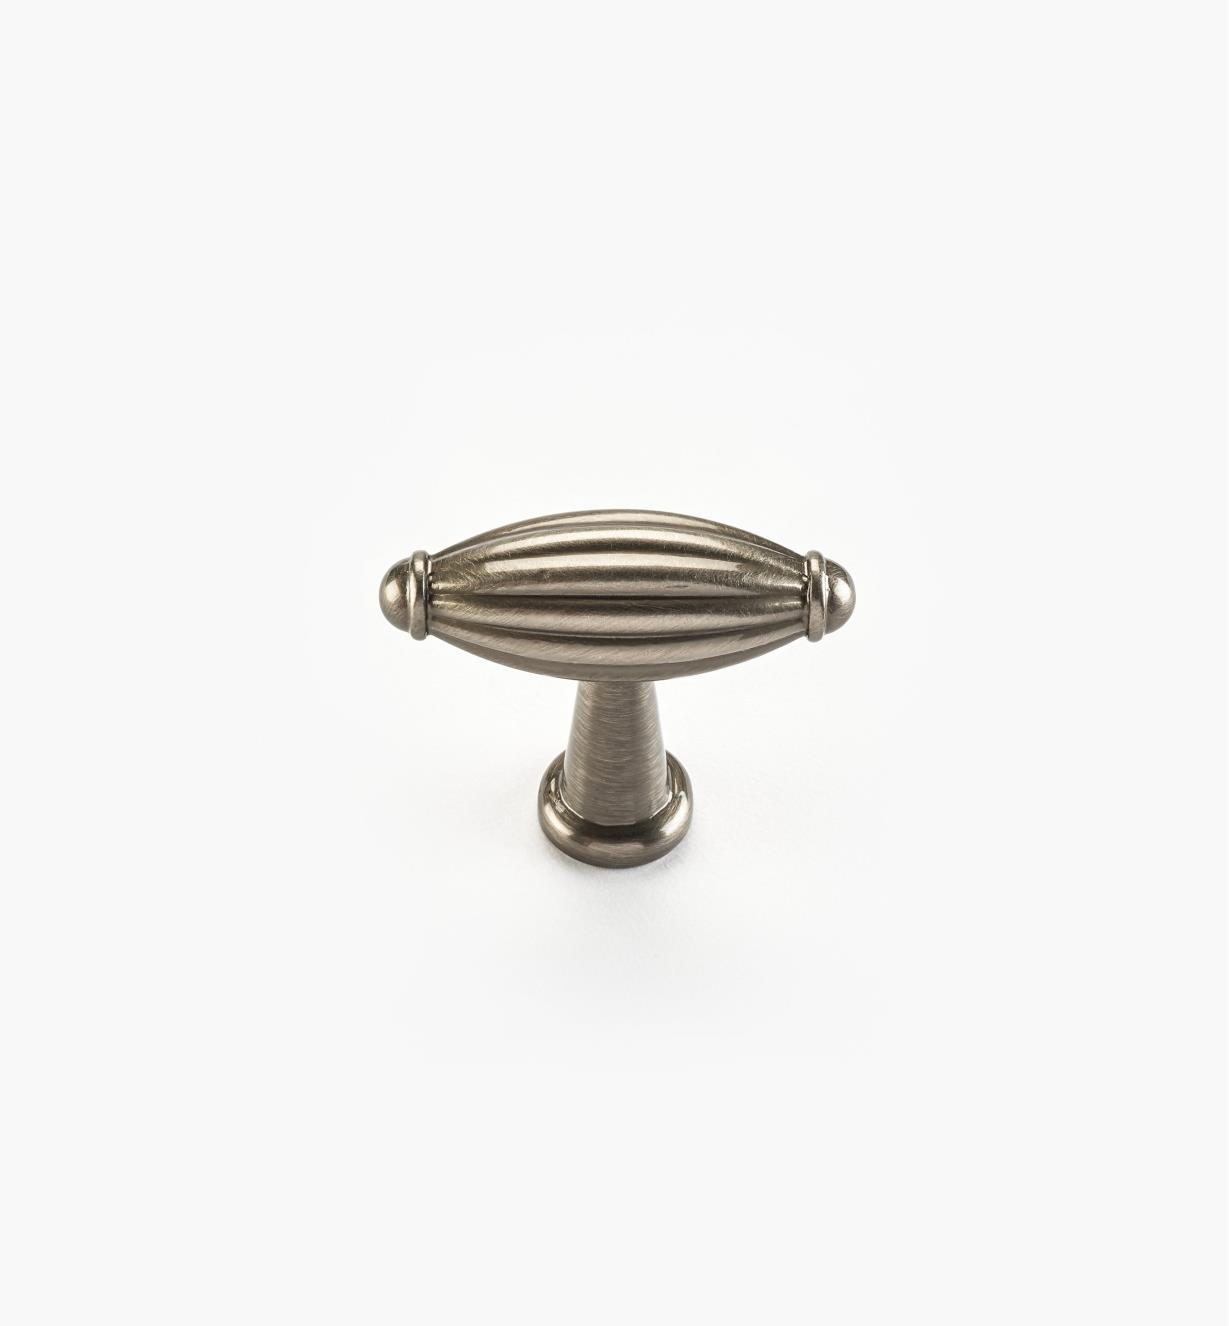 02W4430 - Bouton de 13/4po x 17/16po, série Olive, fini nickel antique